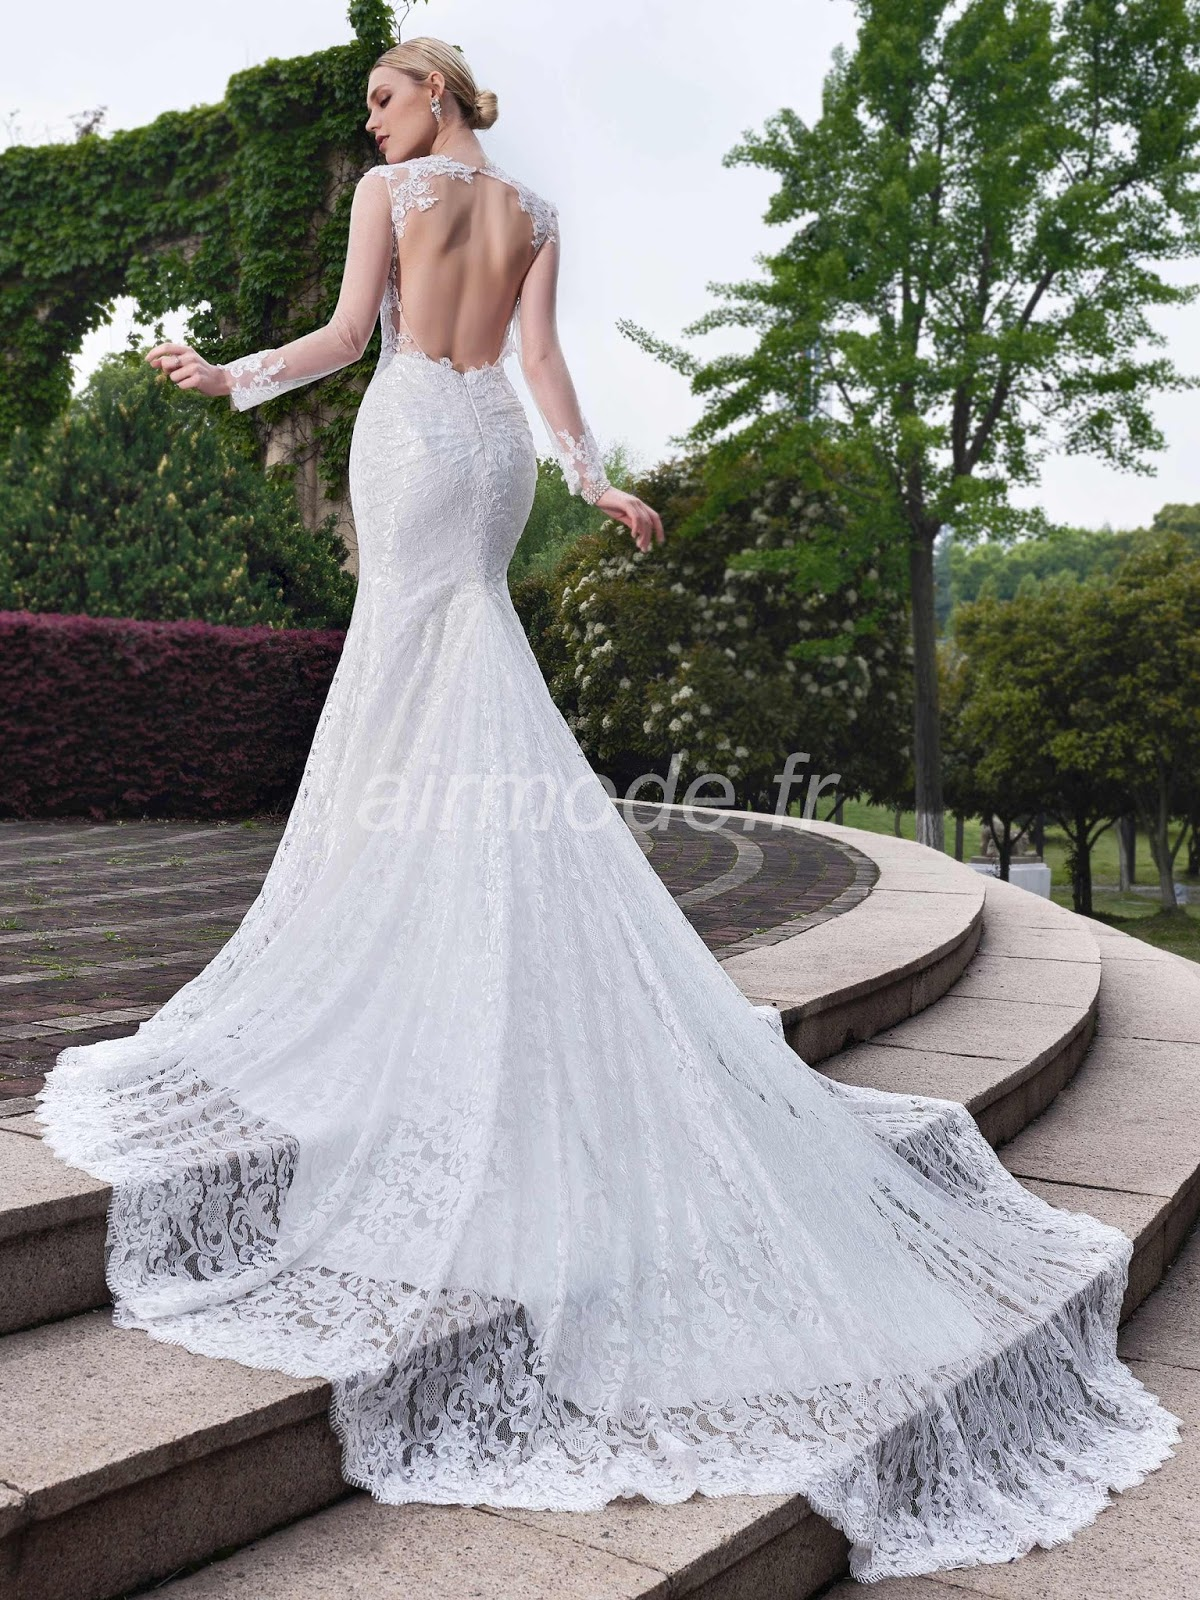 sirène la robe de mariée de jardin / outdoor